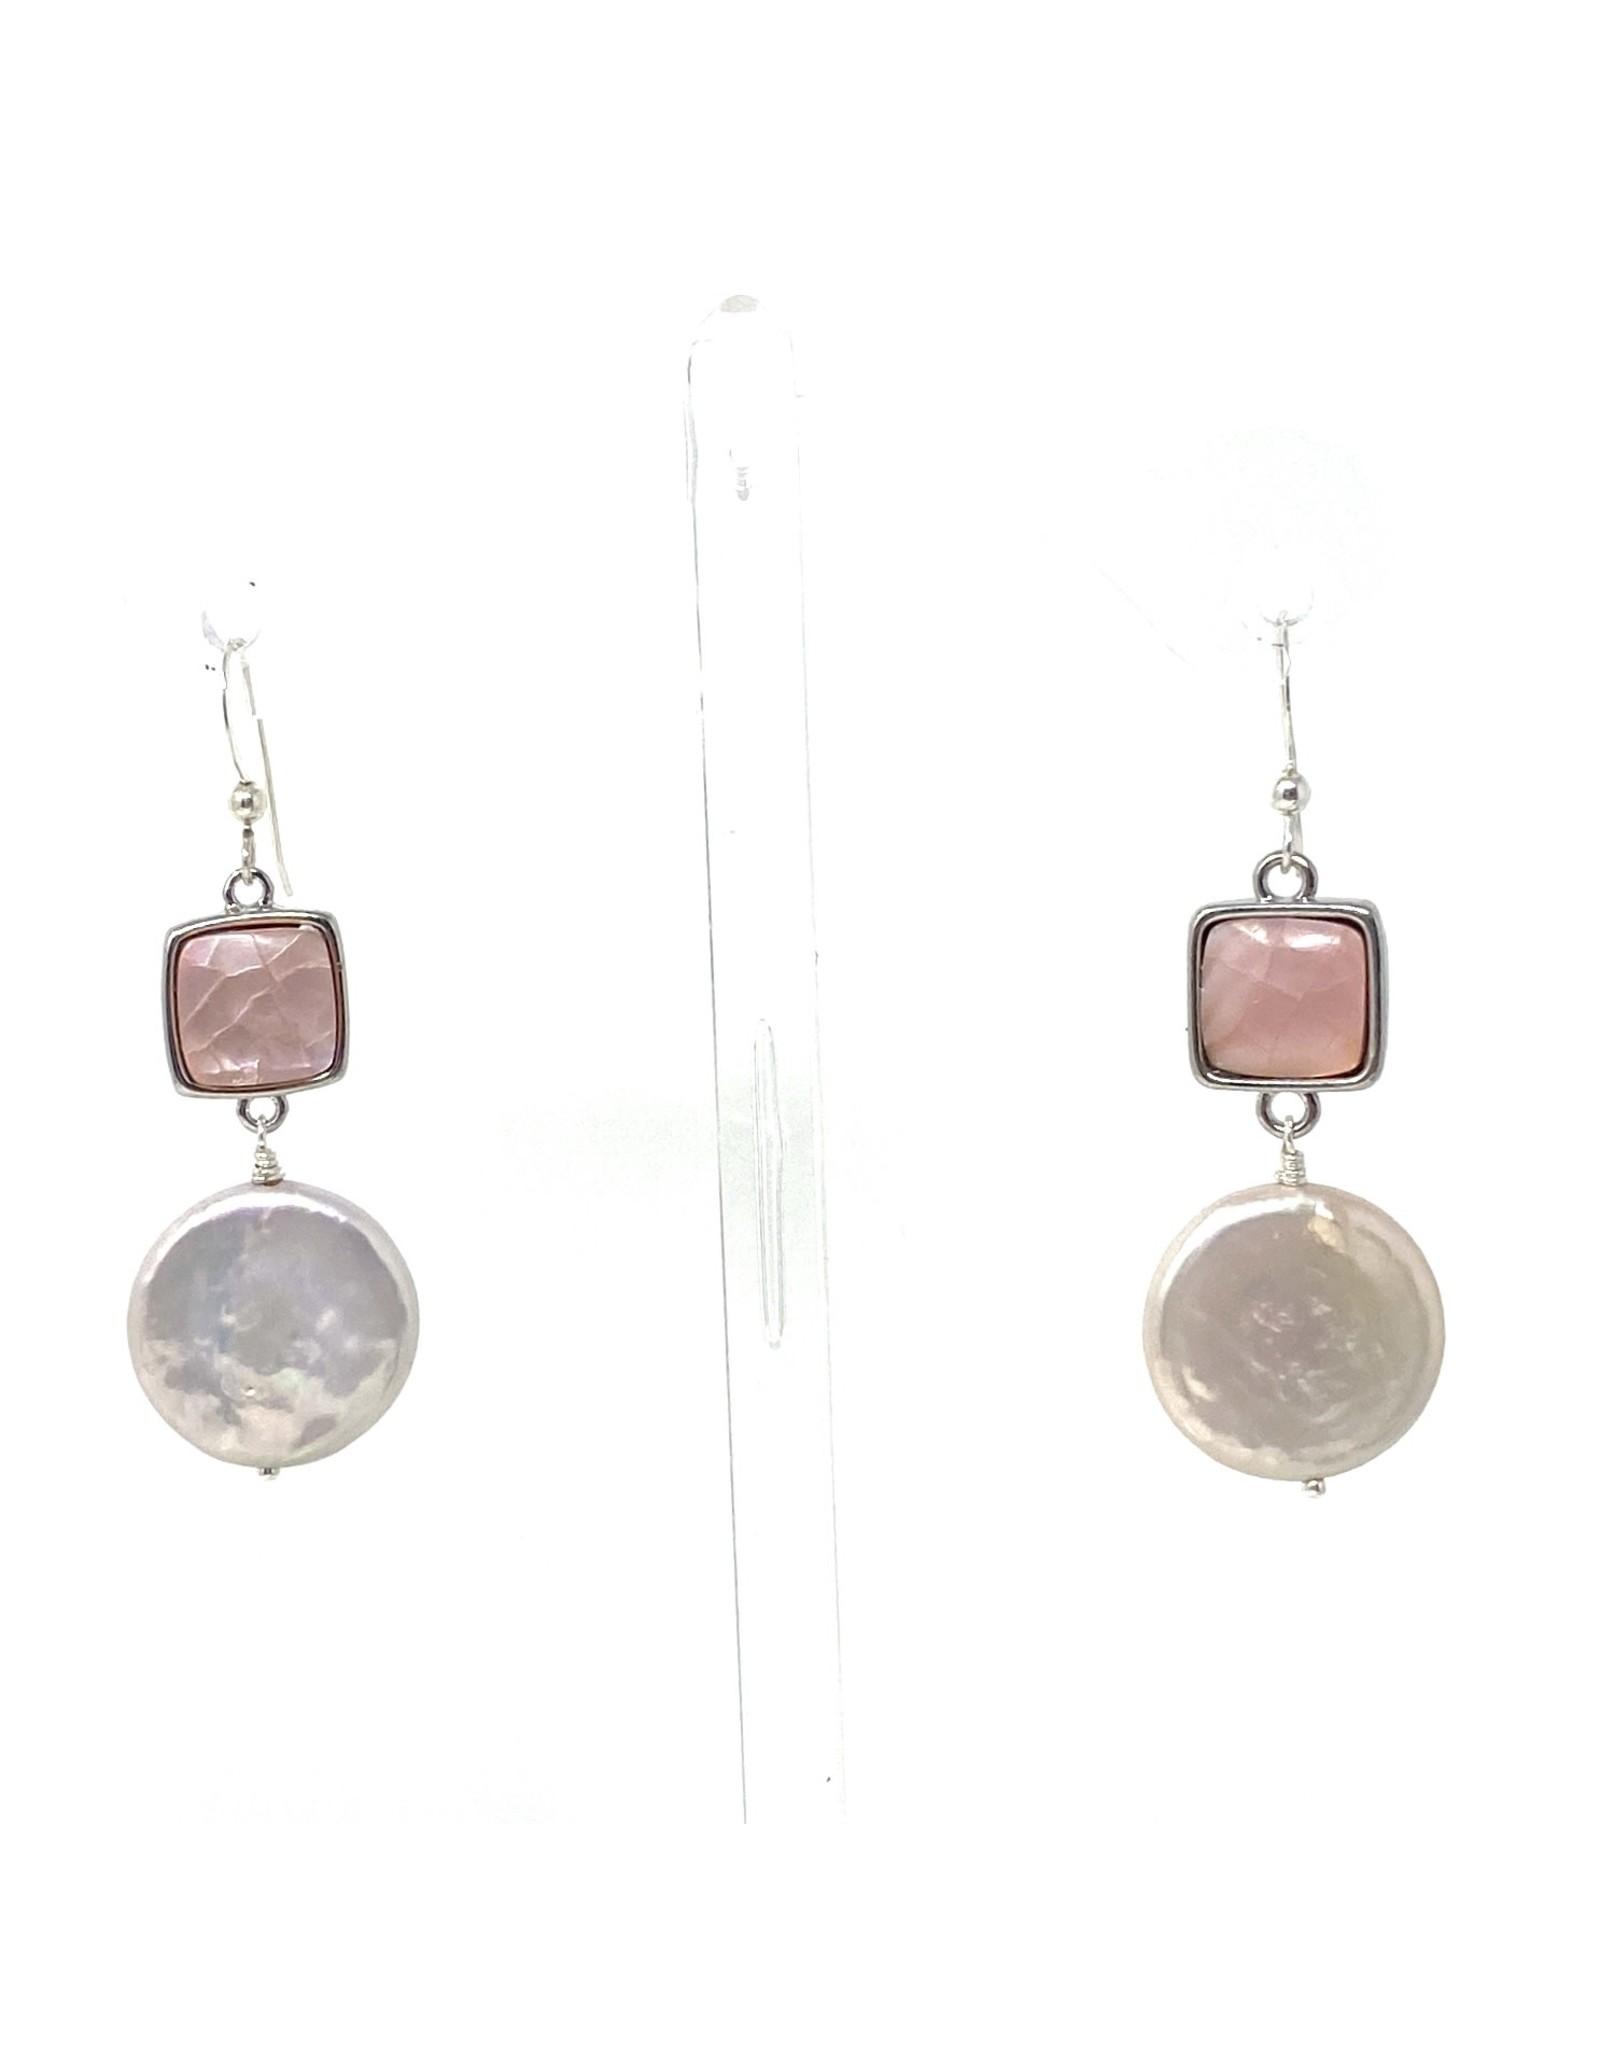 Blush MOP & LG Coin Pearl Earrings